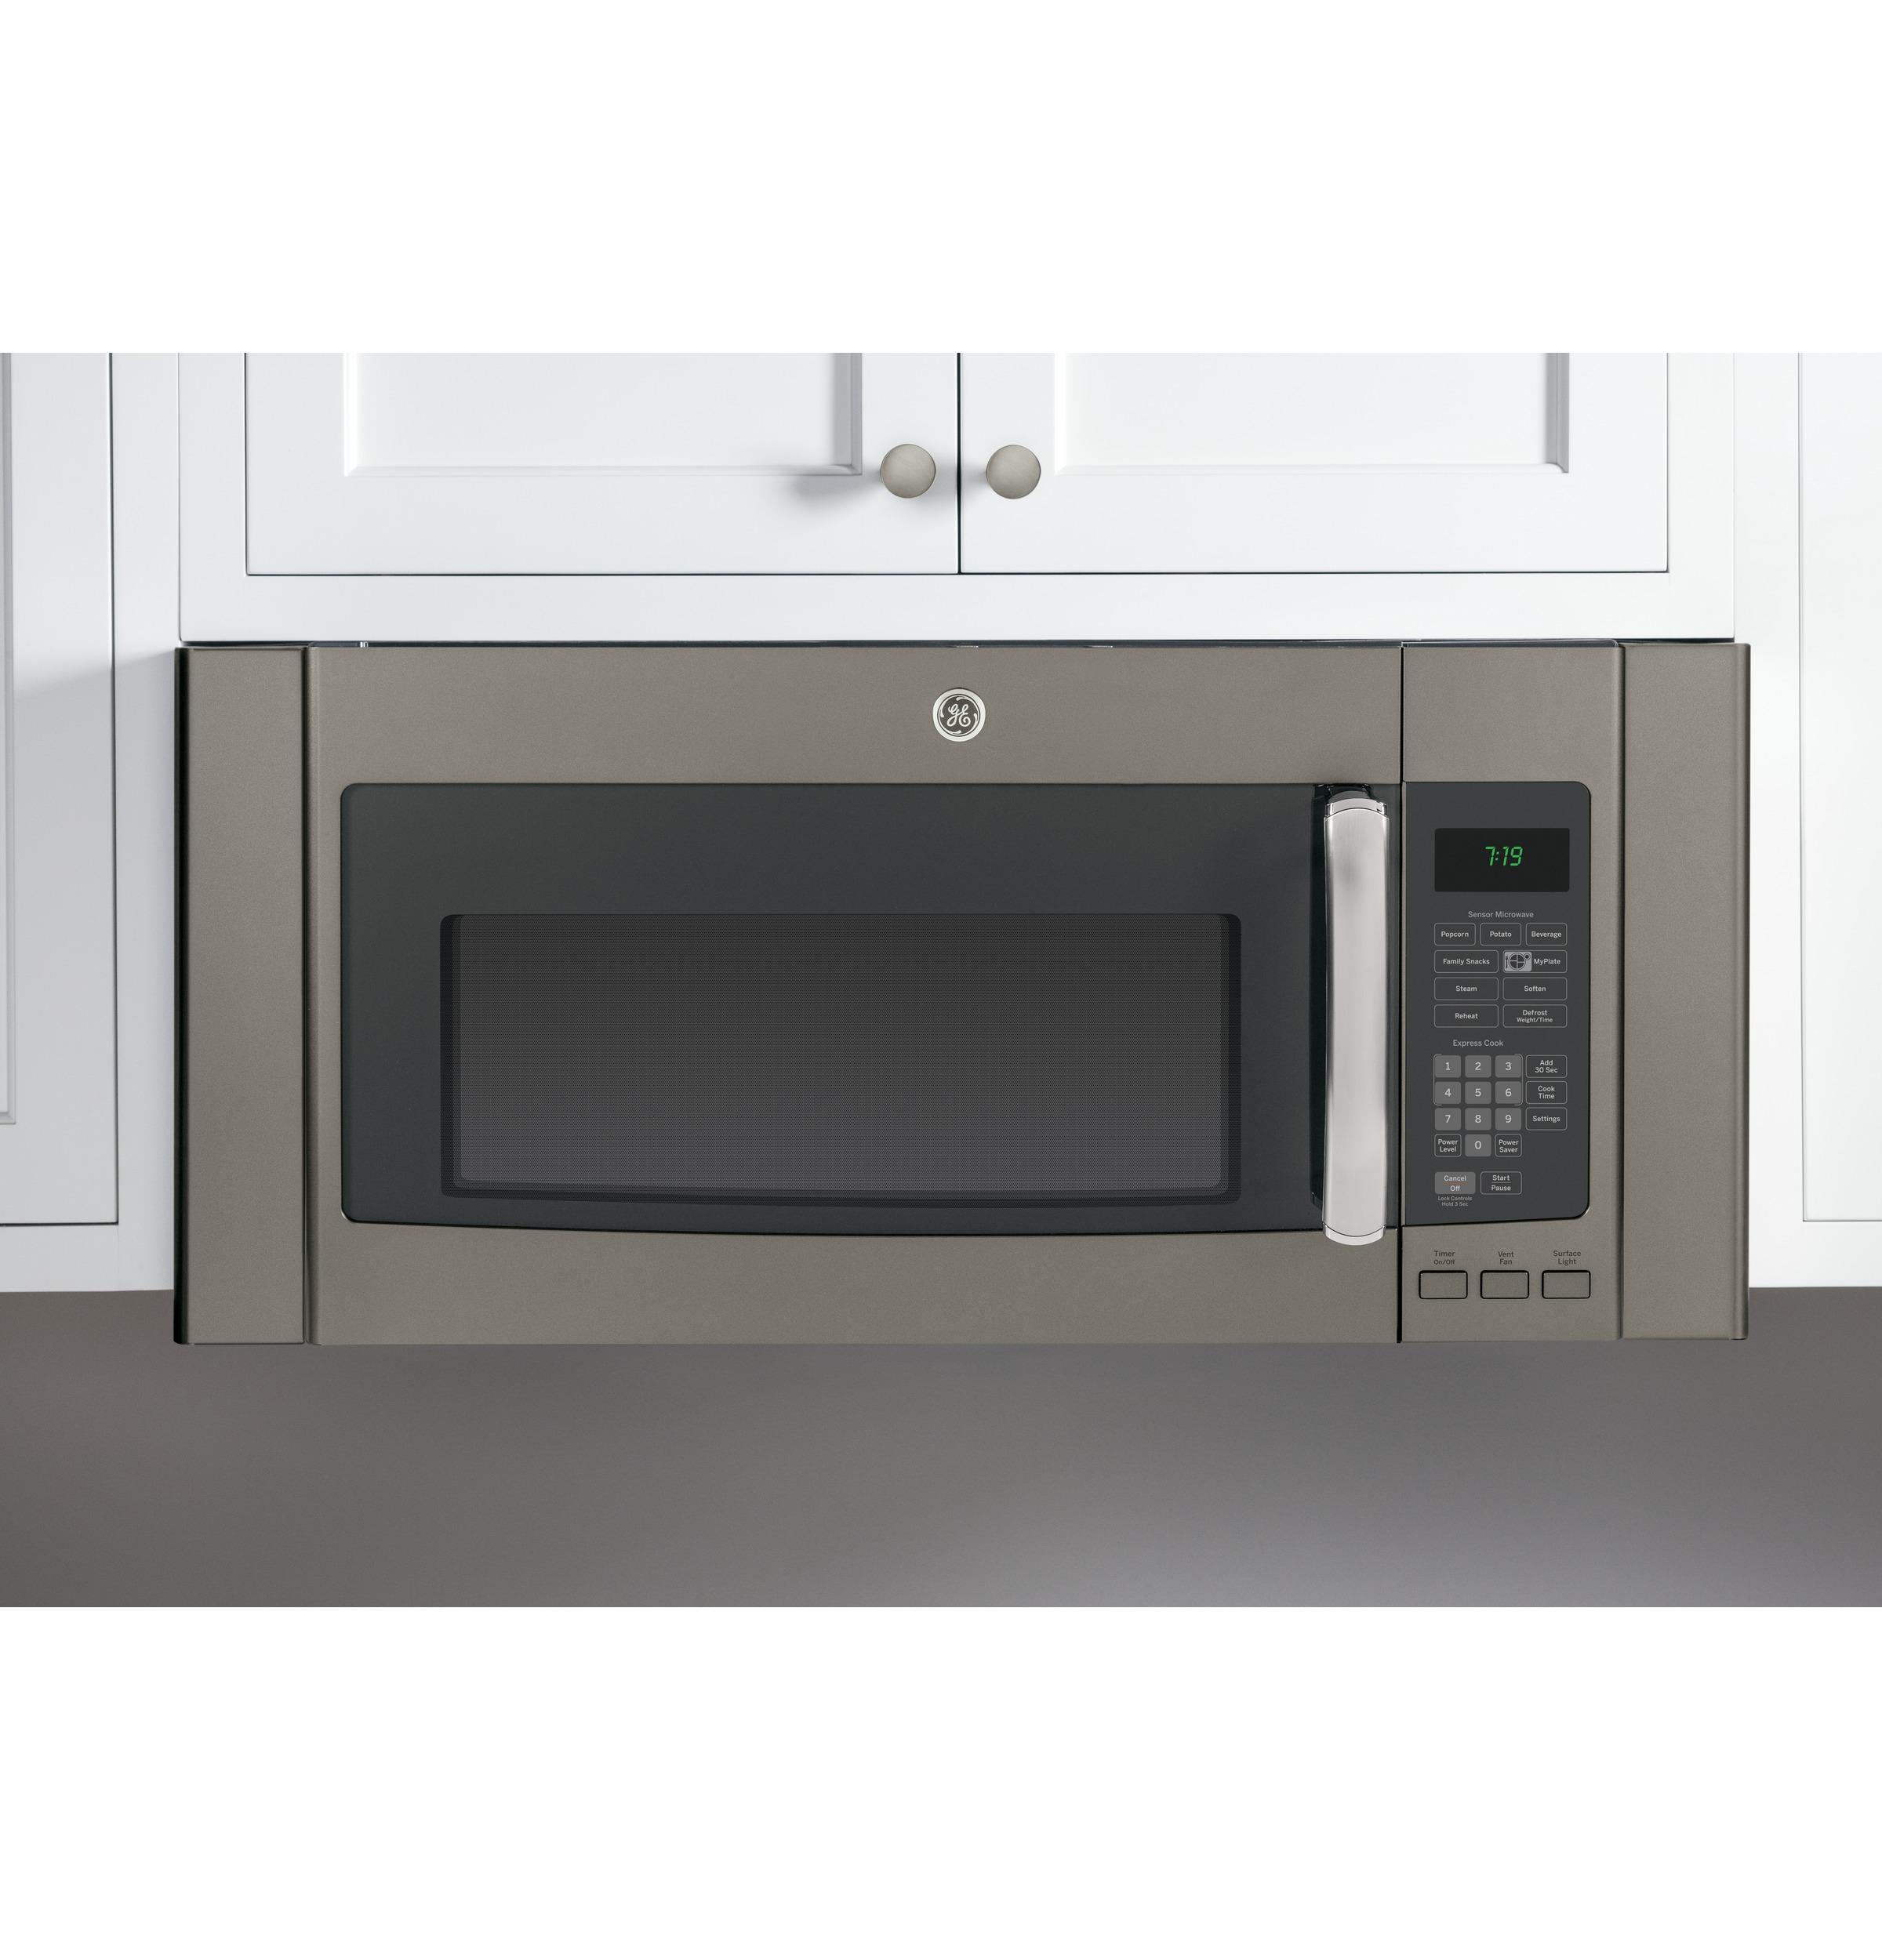 microwave parts accessories trim